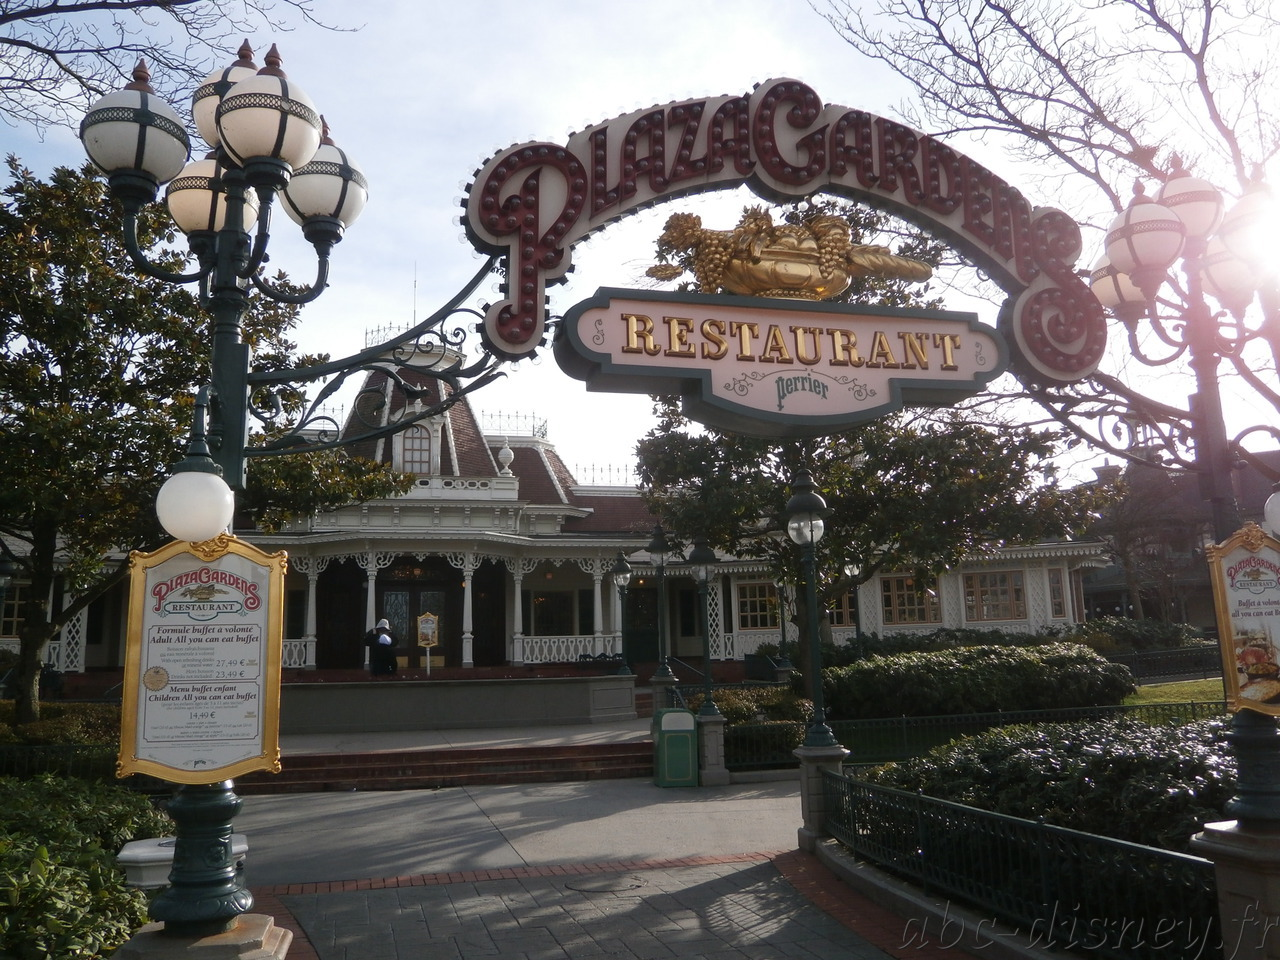 R plaza gardens 3